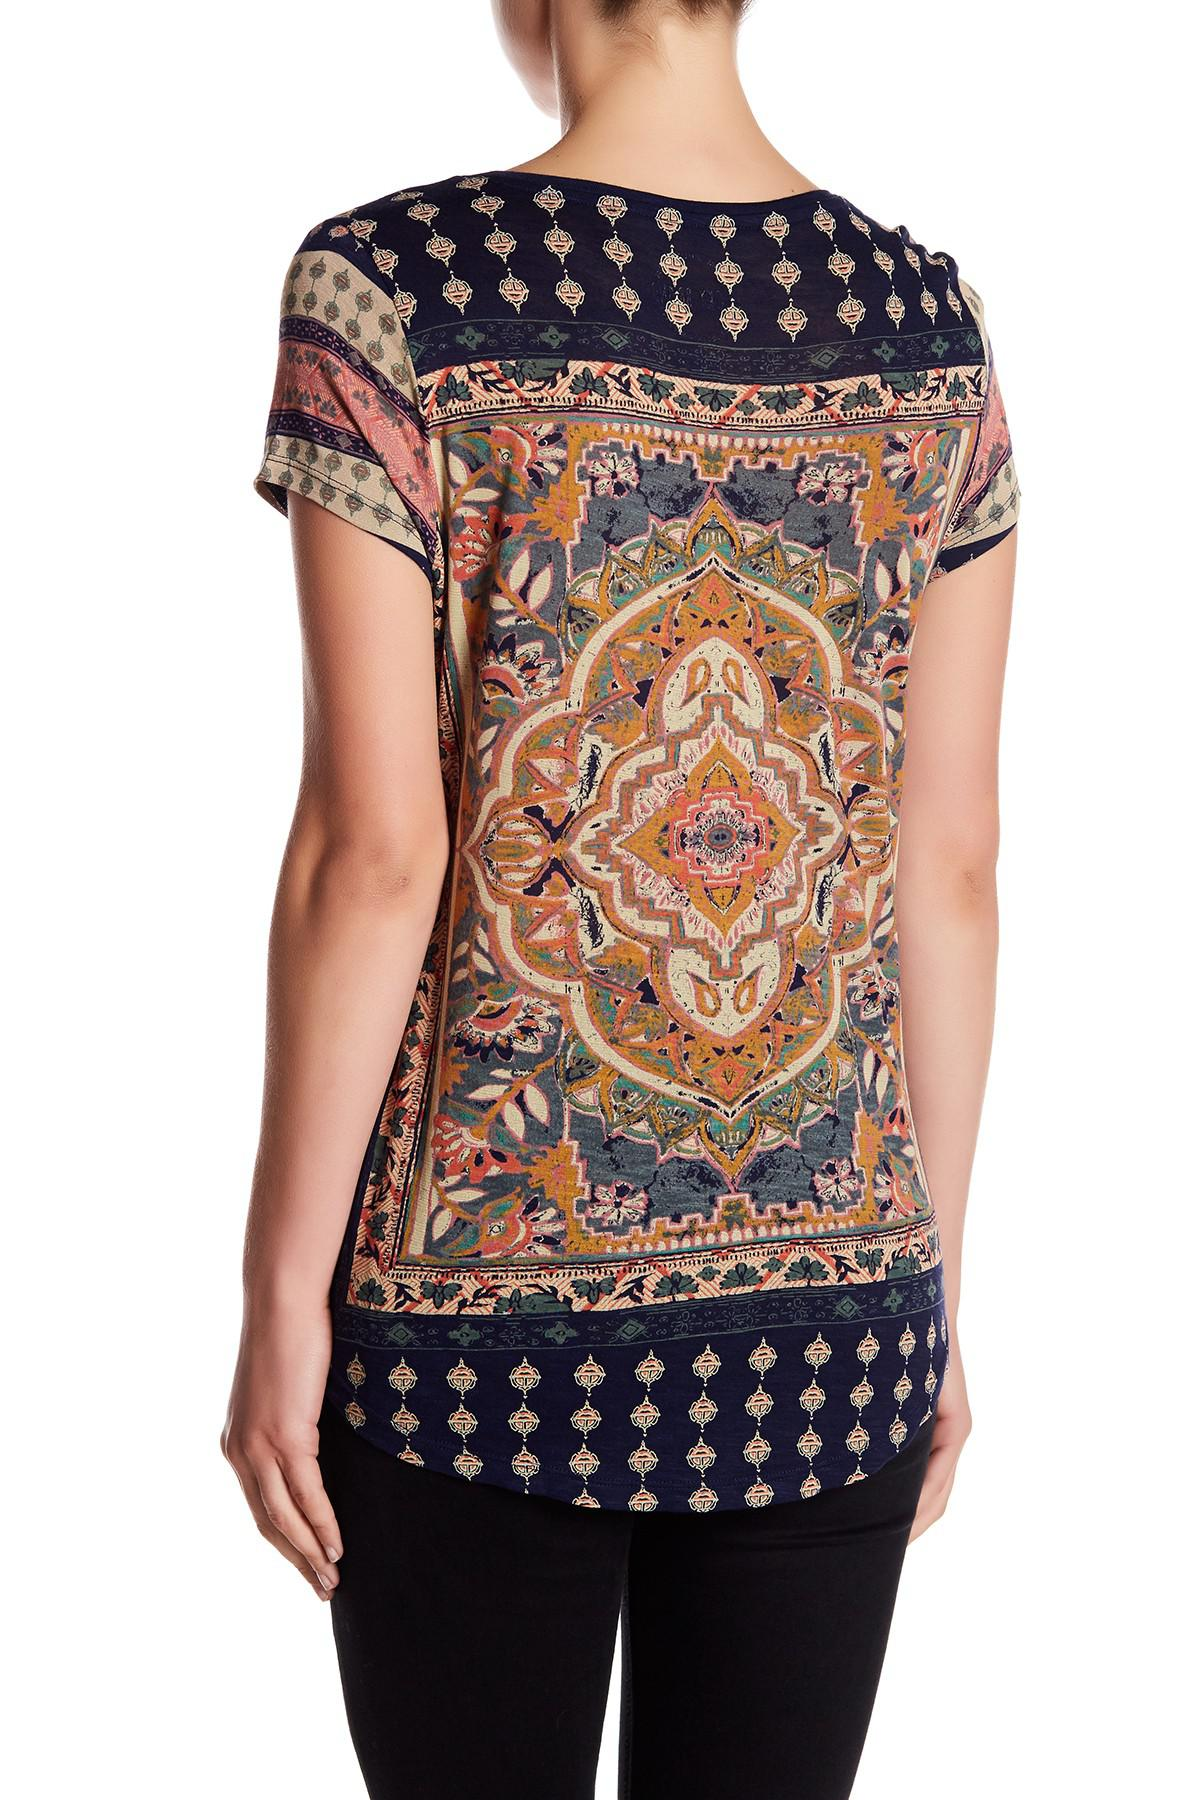 763cb400f9da4 Lyst - Lucky Brand Persian Carpet Tee in Blue